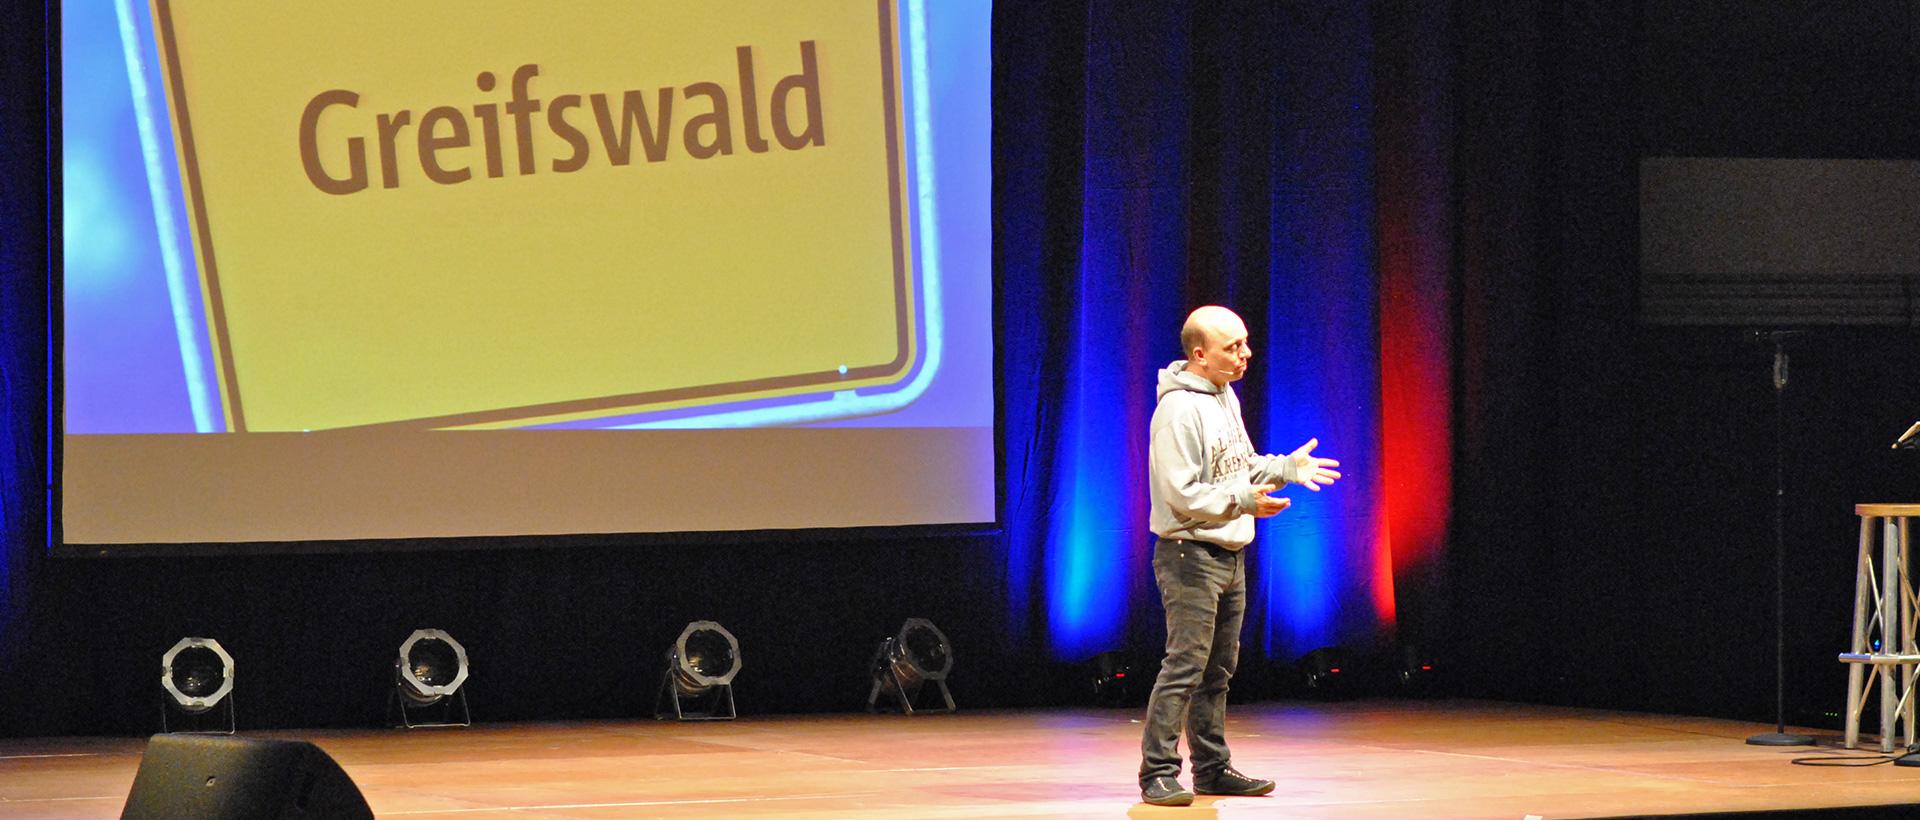 events rückblick 2014 bernhard hoecker events in vorpommern